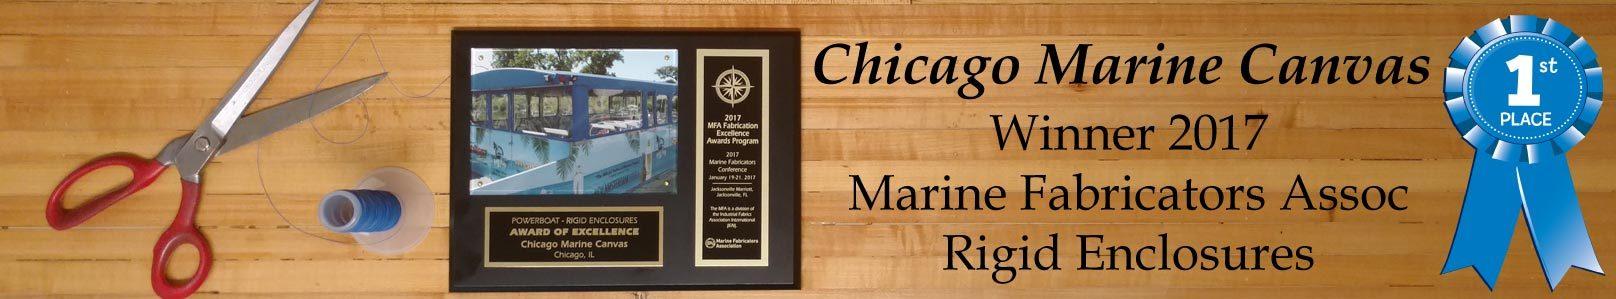 Chicago Marine Canvas - 2017 Marine Fabricator Association Winner